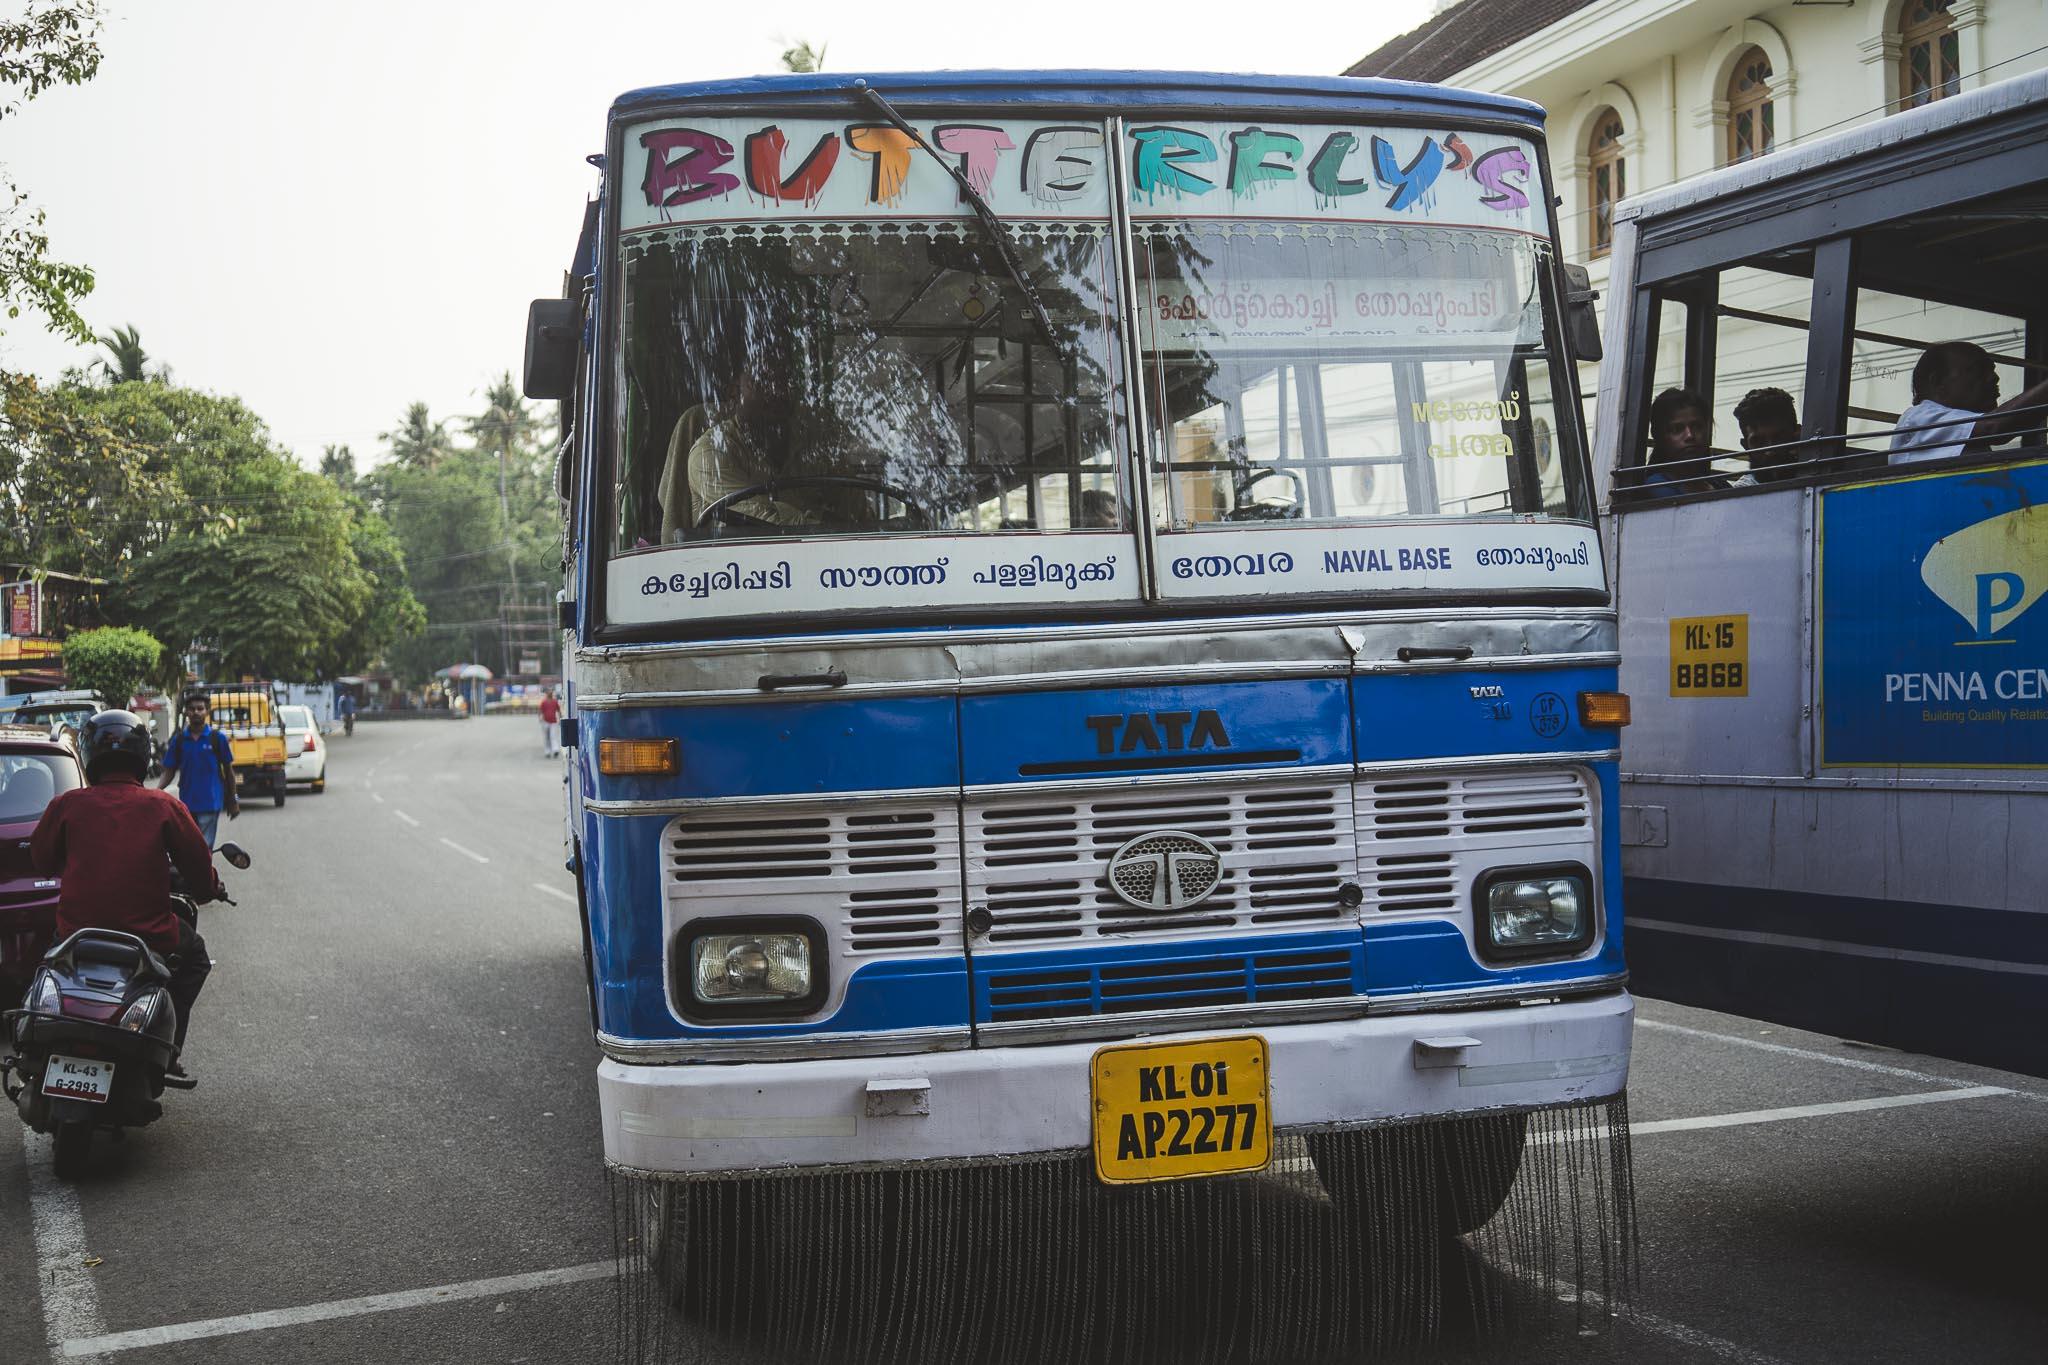 Klasyczny Tata autobus w Kochi